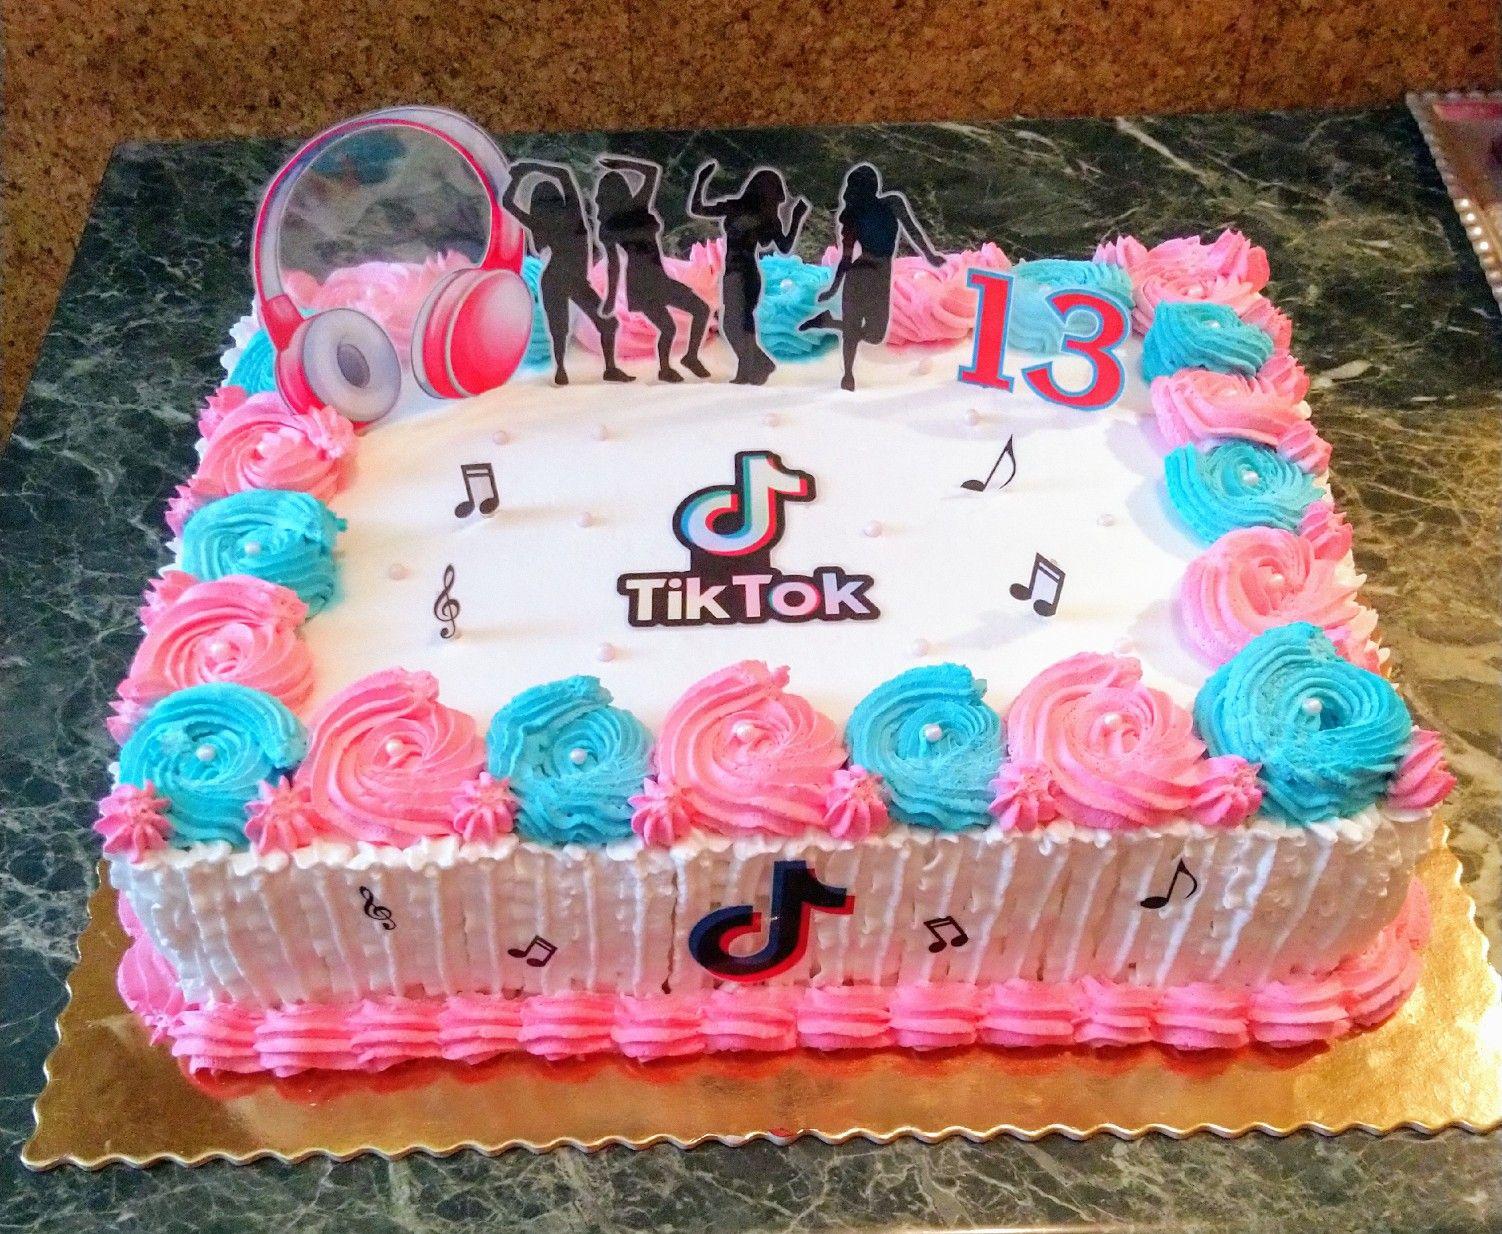 Tik Tok Torta Cool Birthday Cakes Special Birthday Cakes Birthday Sheet Cakes